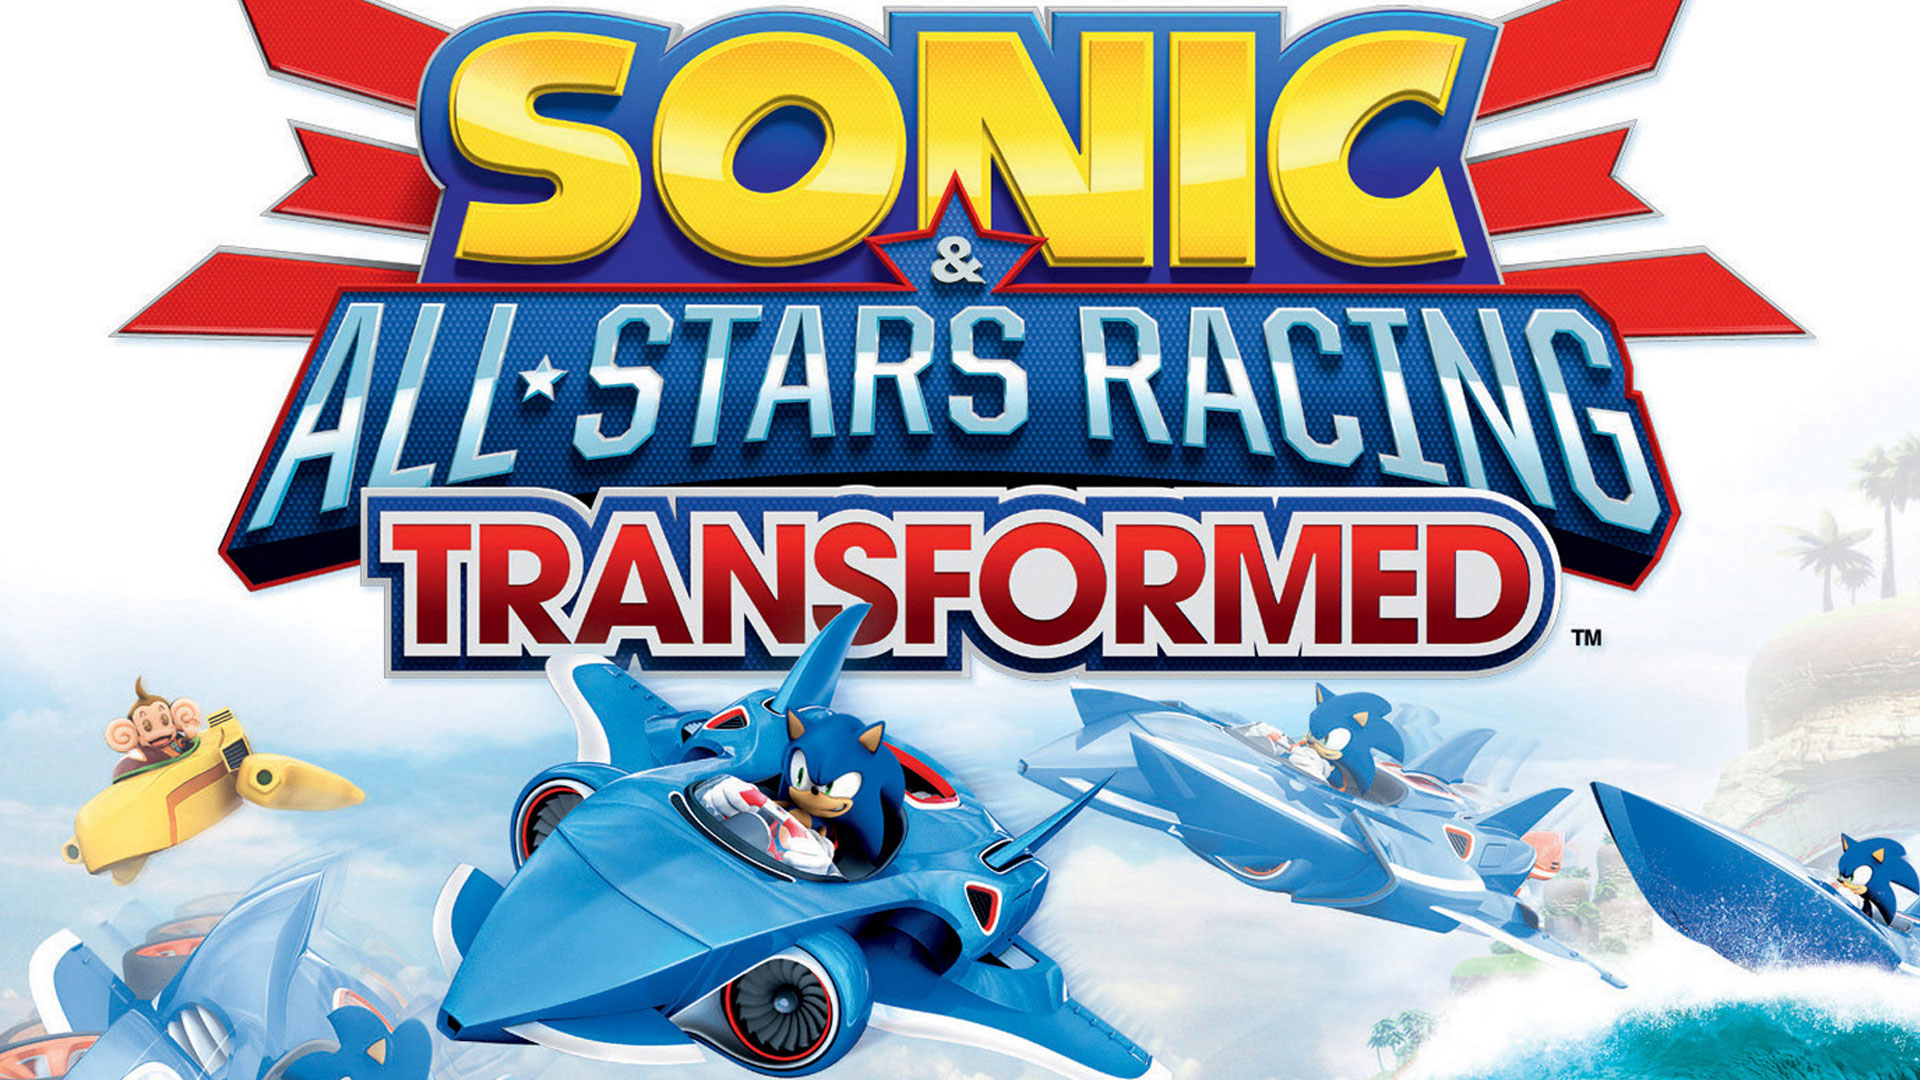 Sonic & All-Stars Racing Transformed Wallpaper in 1920x1080